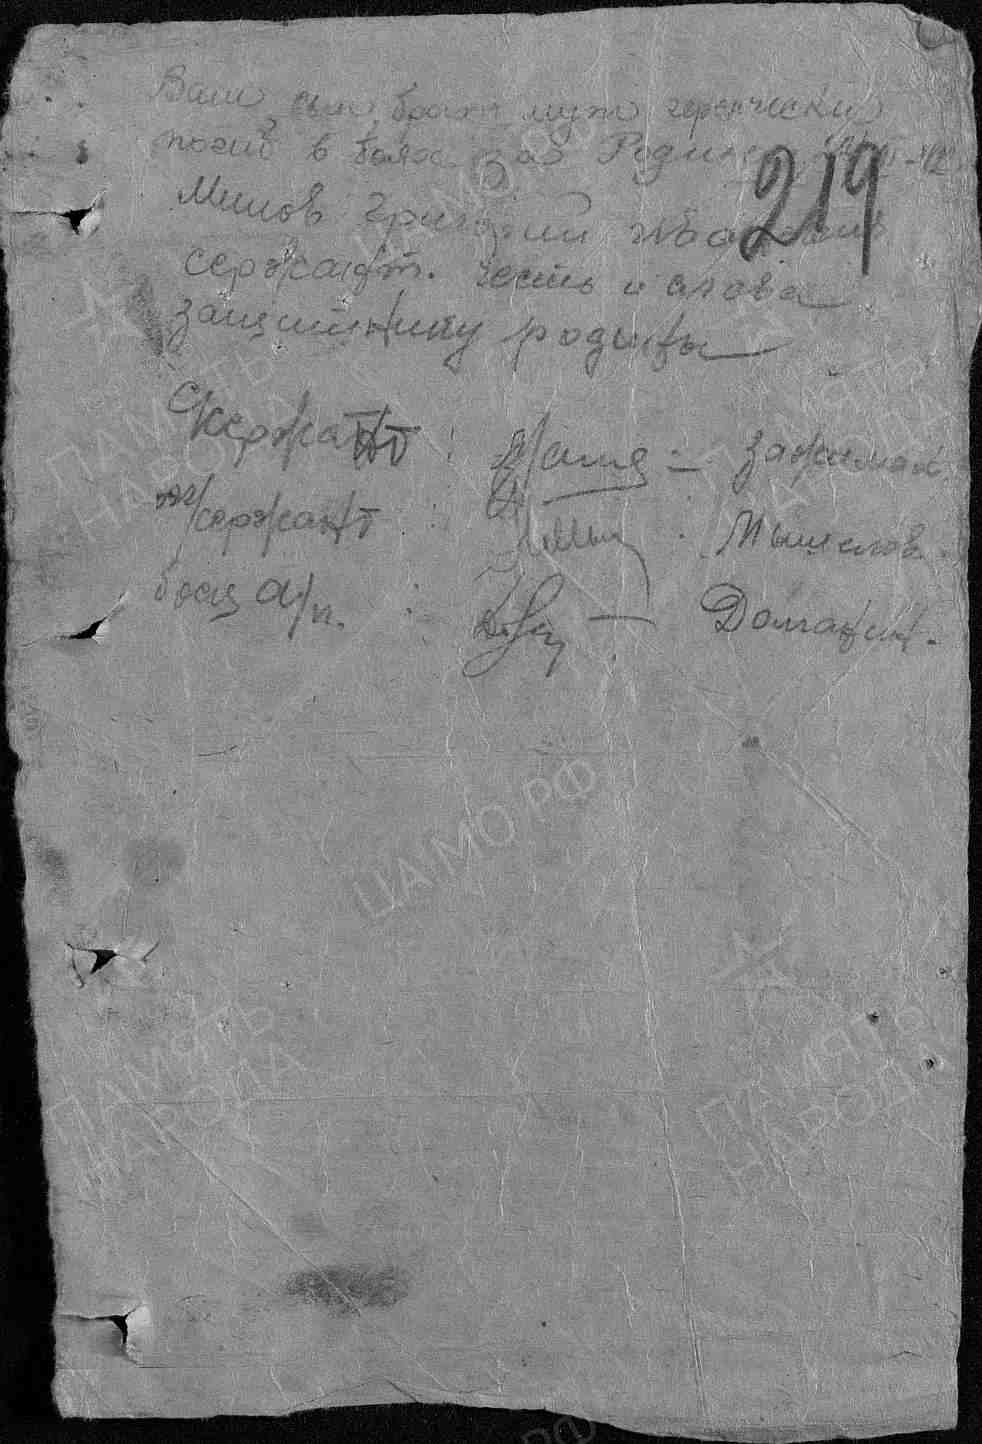 https://cdn.obd-memorial.ru/html/imagelink?path=8ec01306-39e7-4be2-b465-a5930ab53574